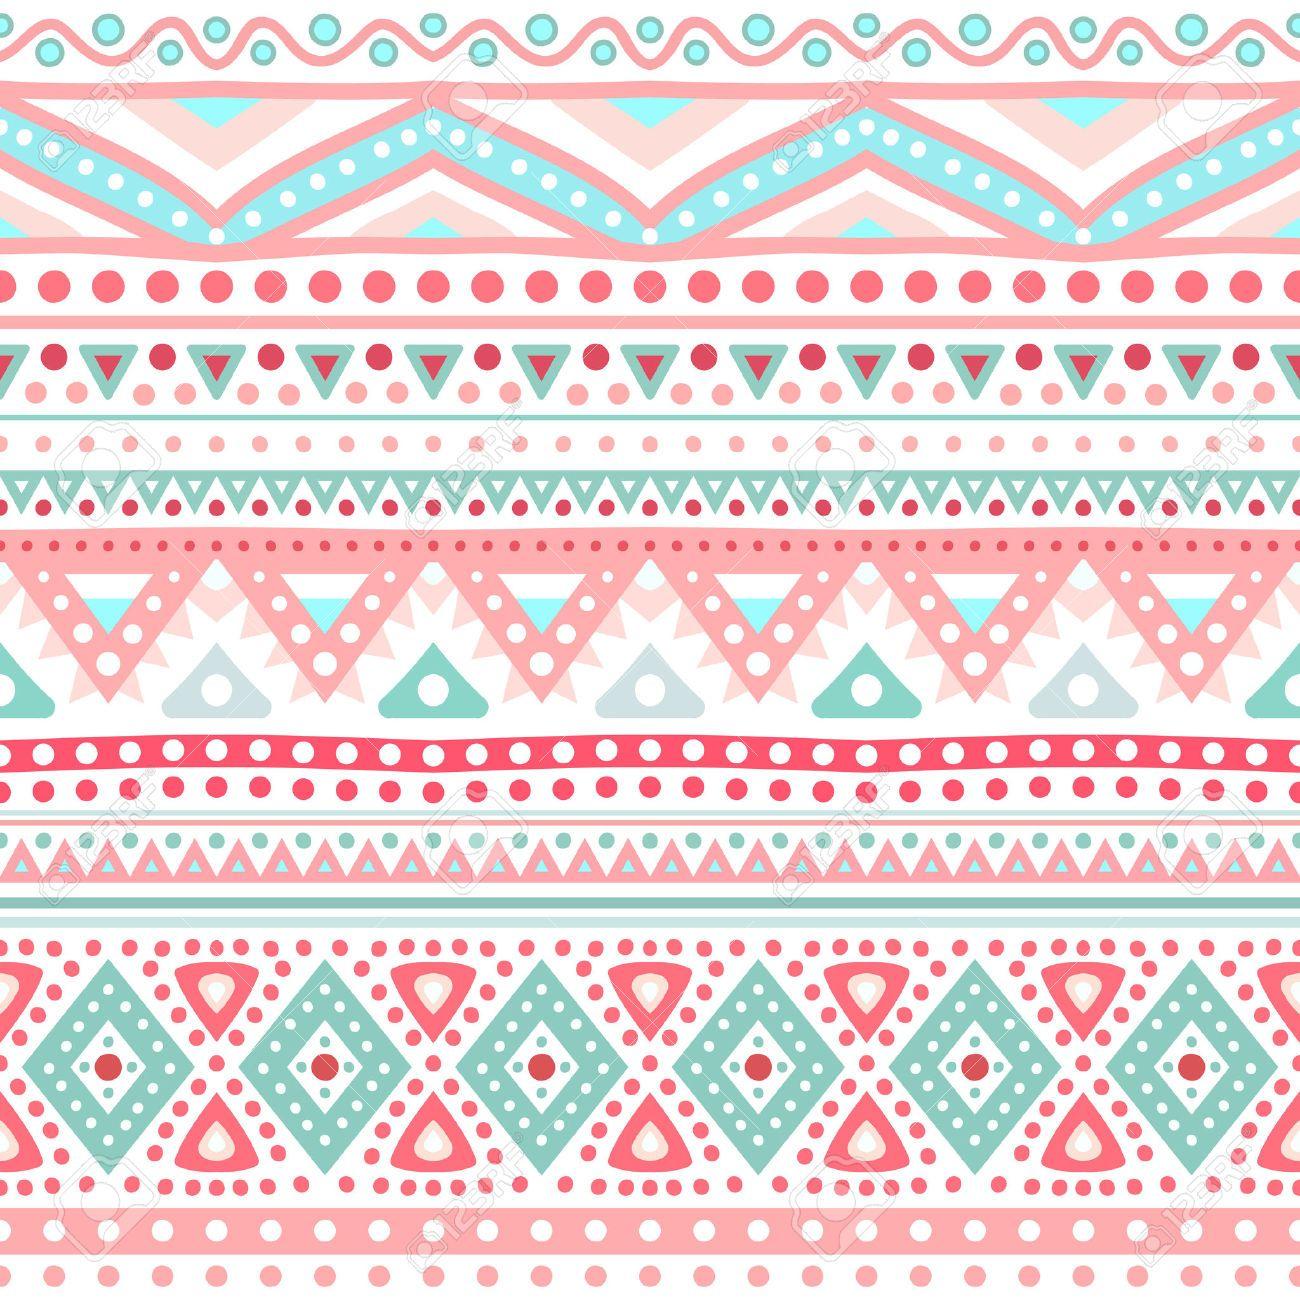 Tumblr Aztec Pattern Backgrounds wwwpixsharkcom 1300x1300